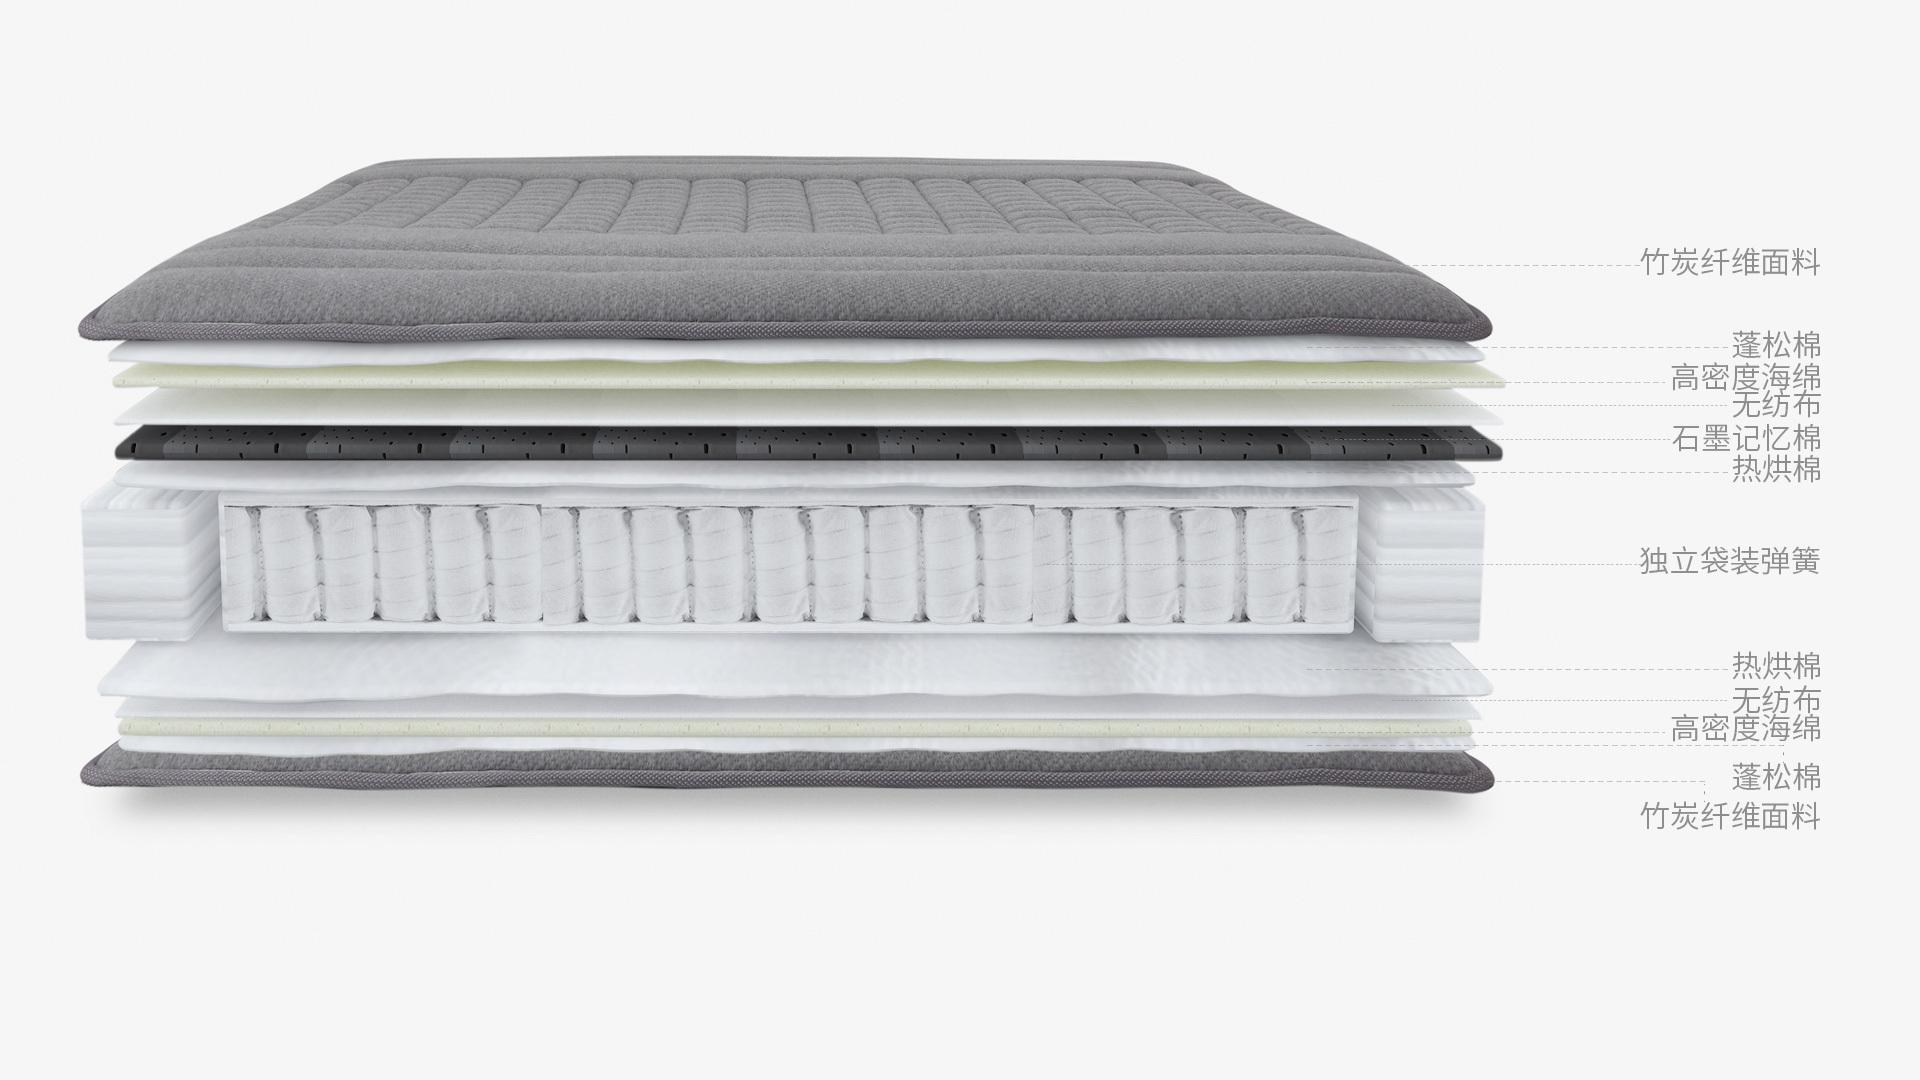 26cm厚12层优质填充<br/>满足碳科技床垫的全睡眠需求